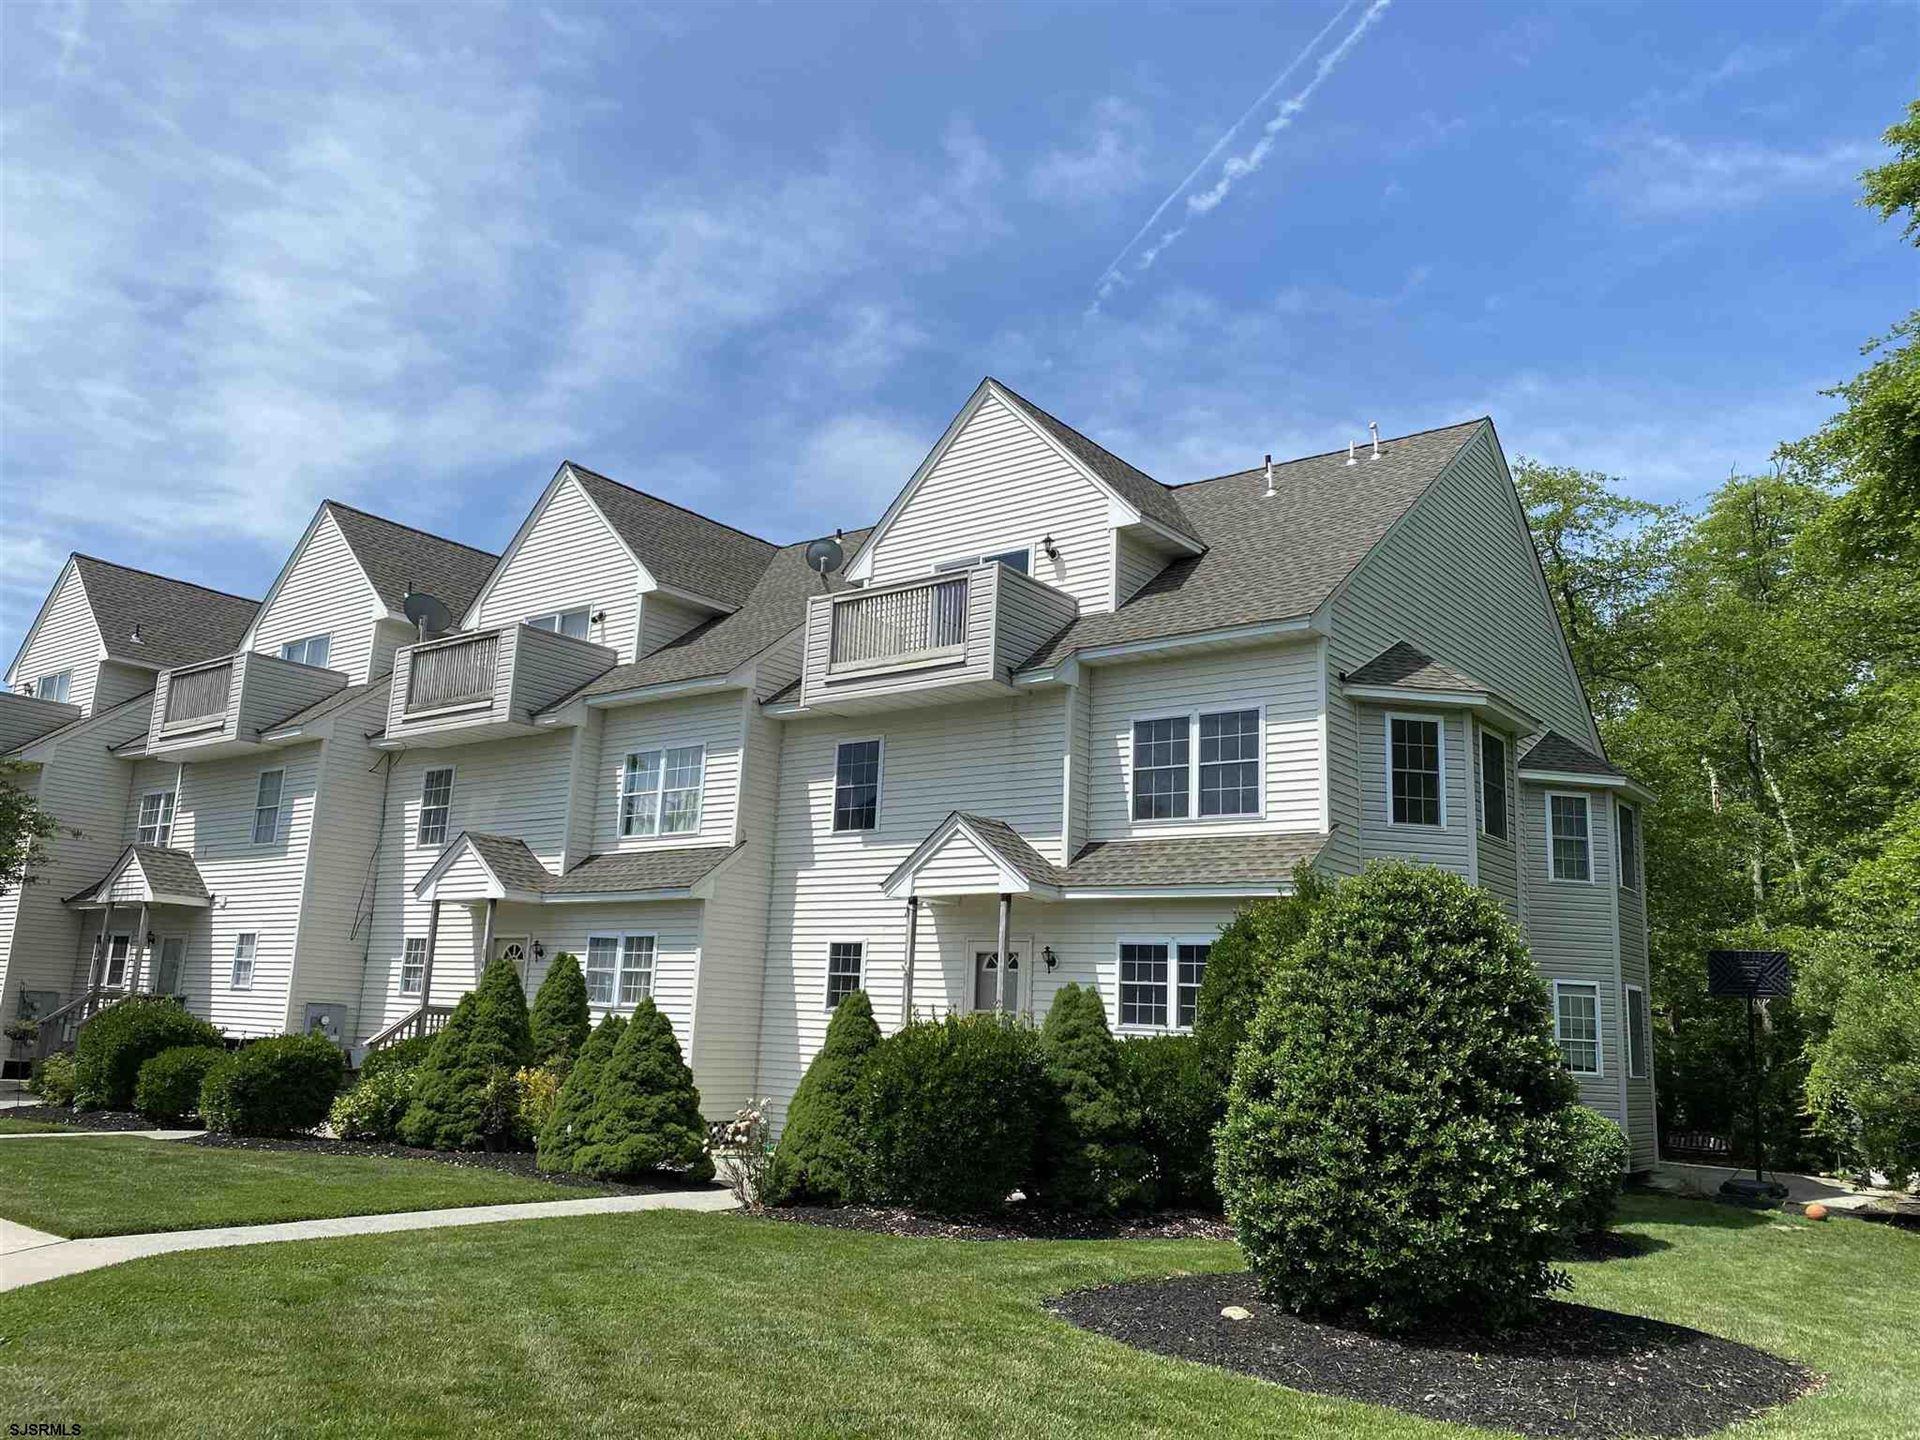 106 Duchess Ct, Egg Harbor, NJ 08234 - #: 551816